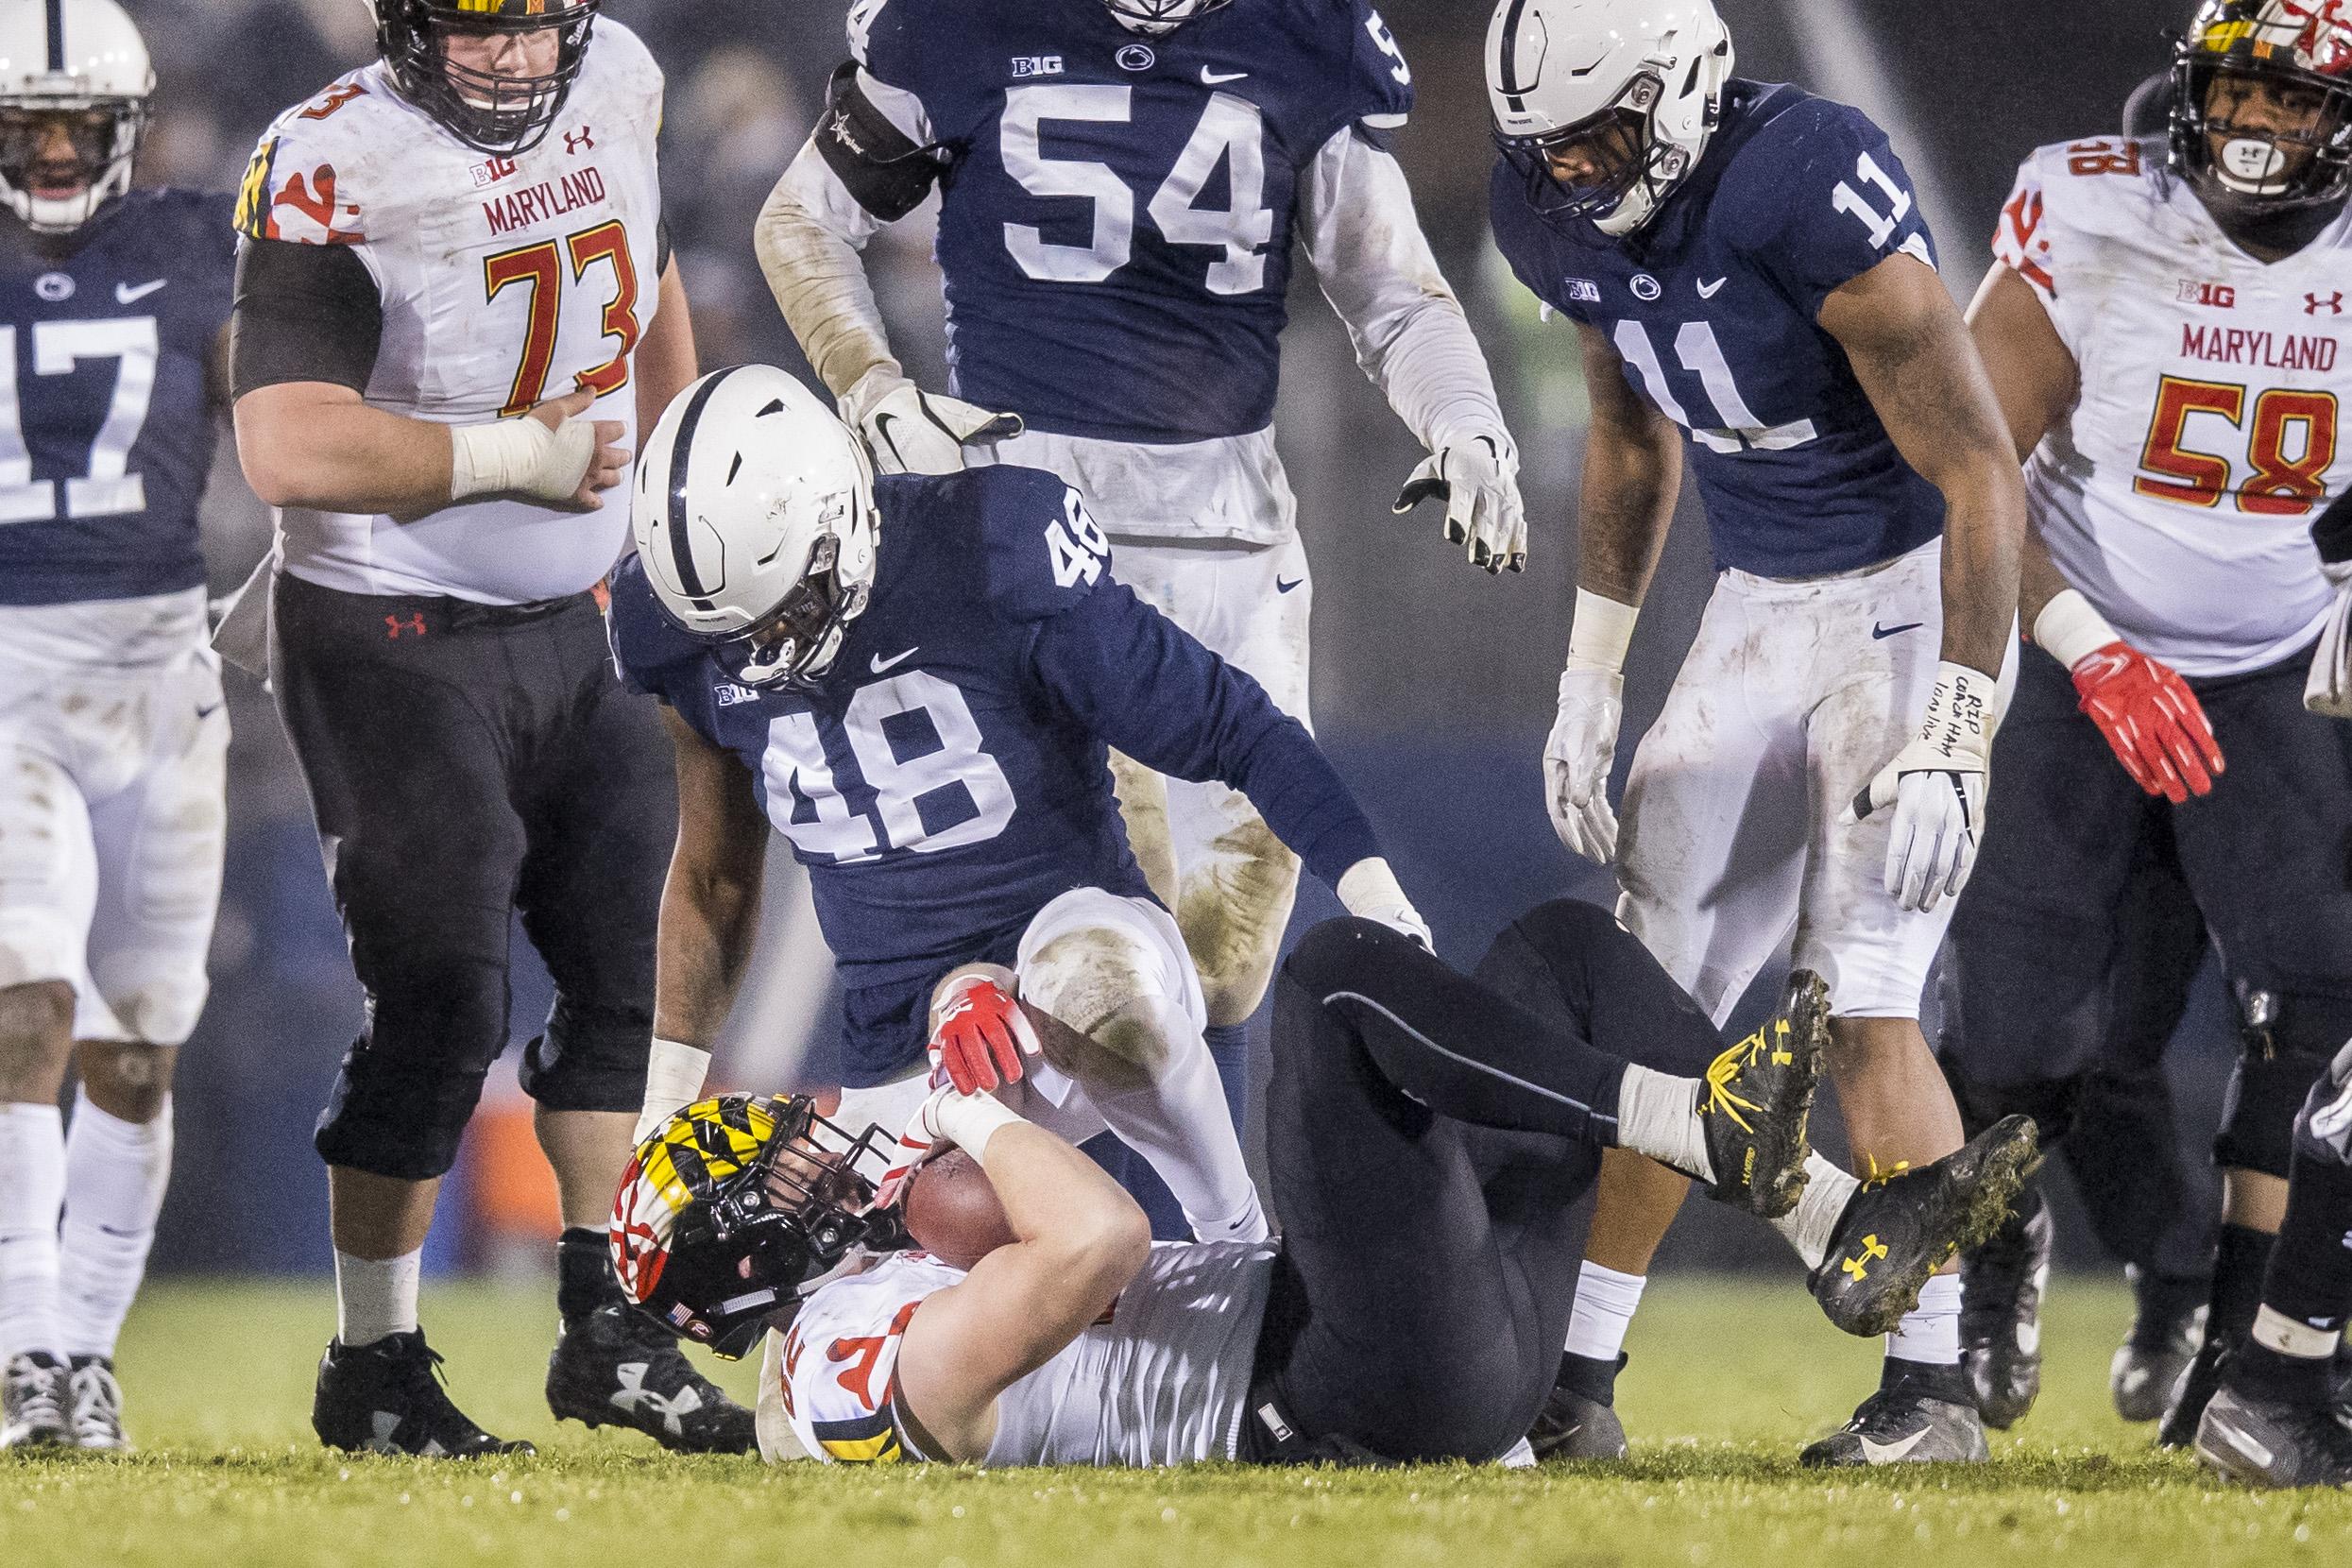 NFL Draft 2019: Penn State DE Shareef Miller to visit hometown Philadelphia Eagles, report says